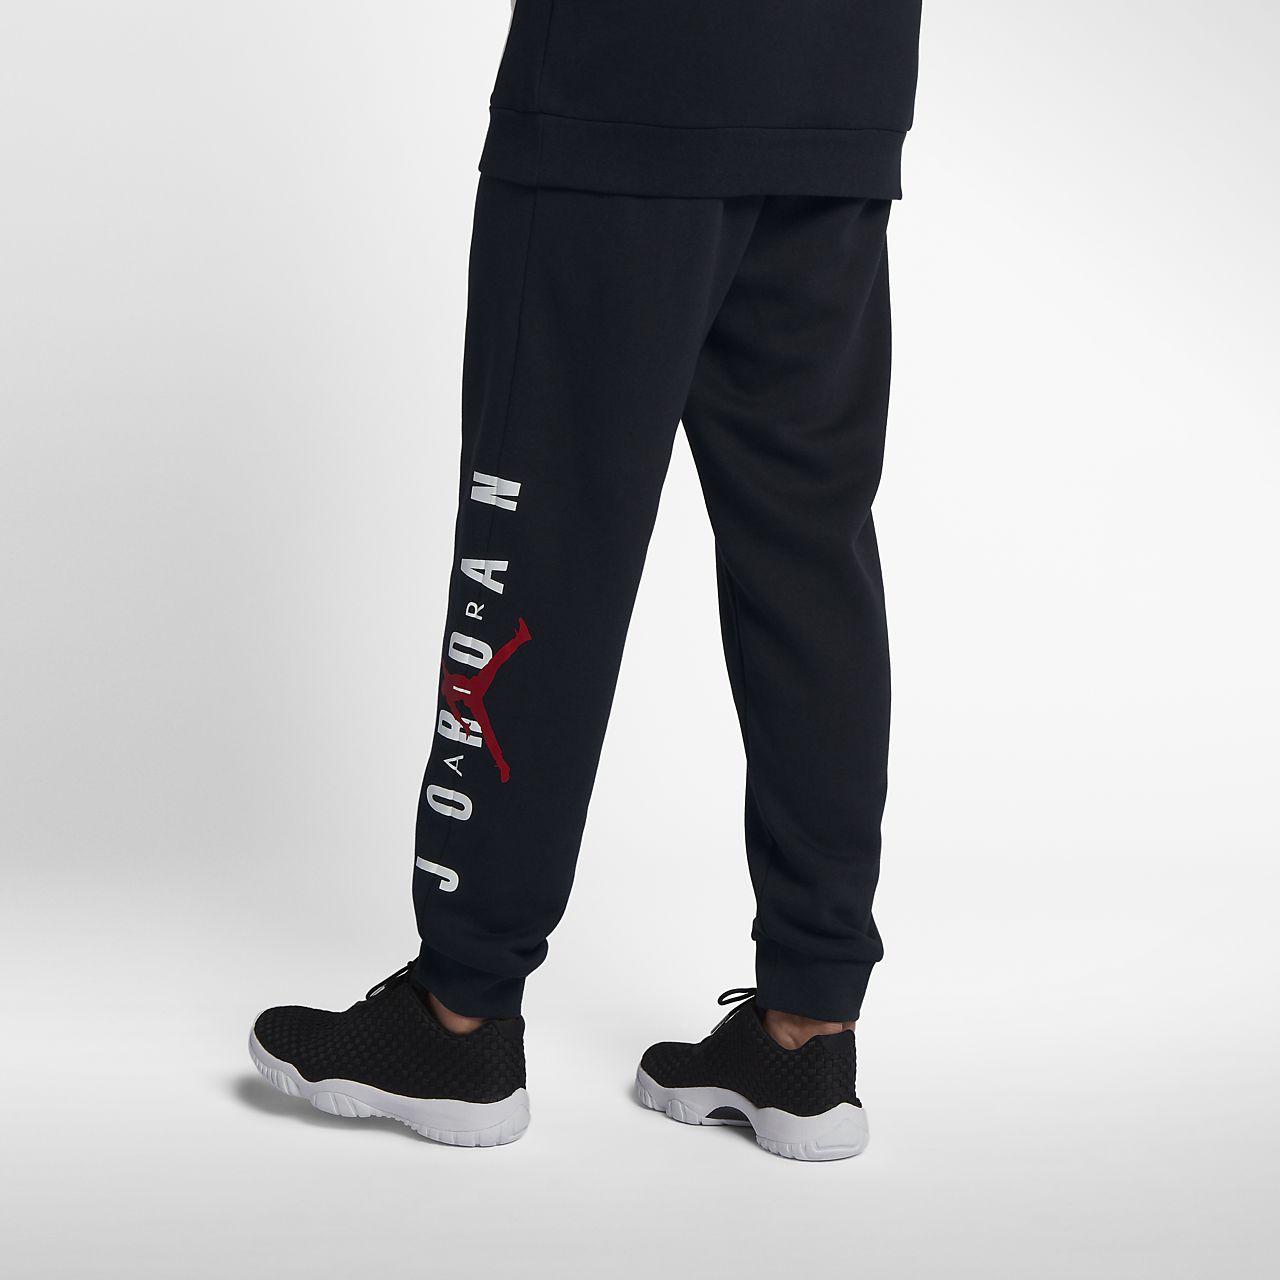 07ad1f5f412 Jordan Jumpman Air Men's Fleece Pants. Nike.com